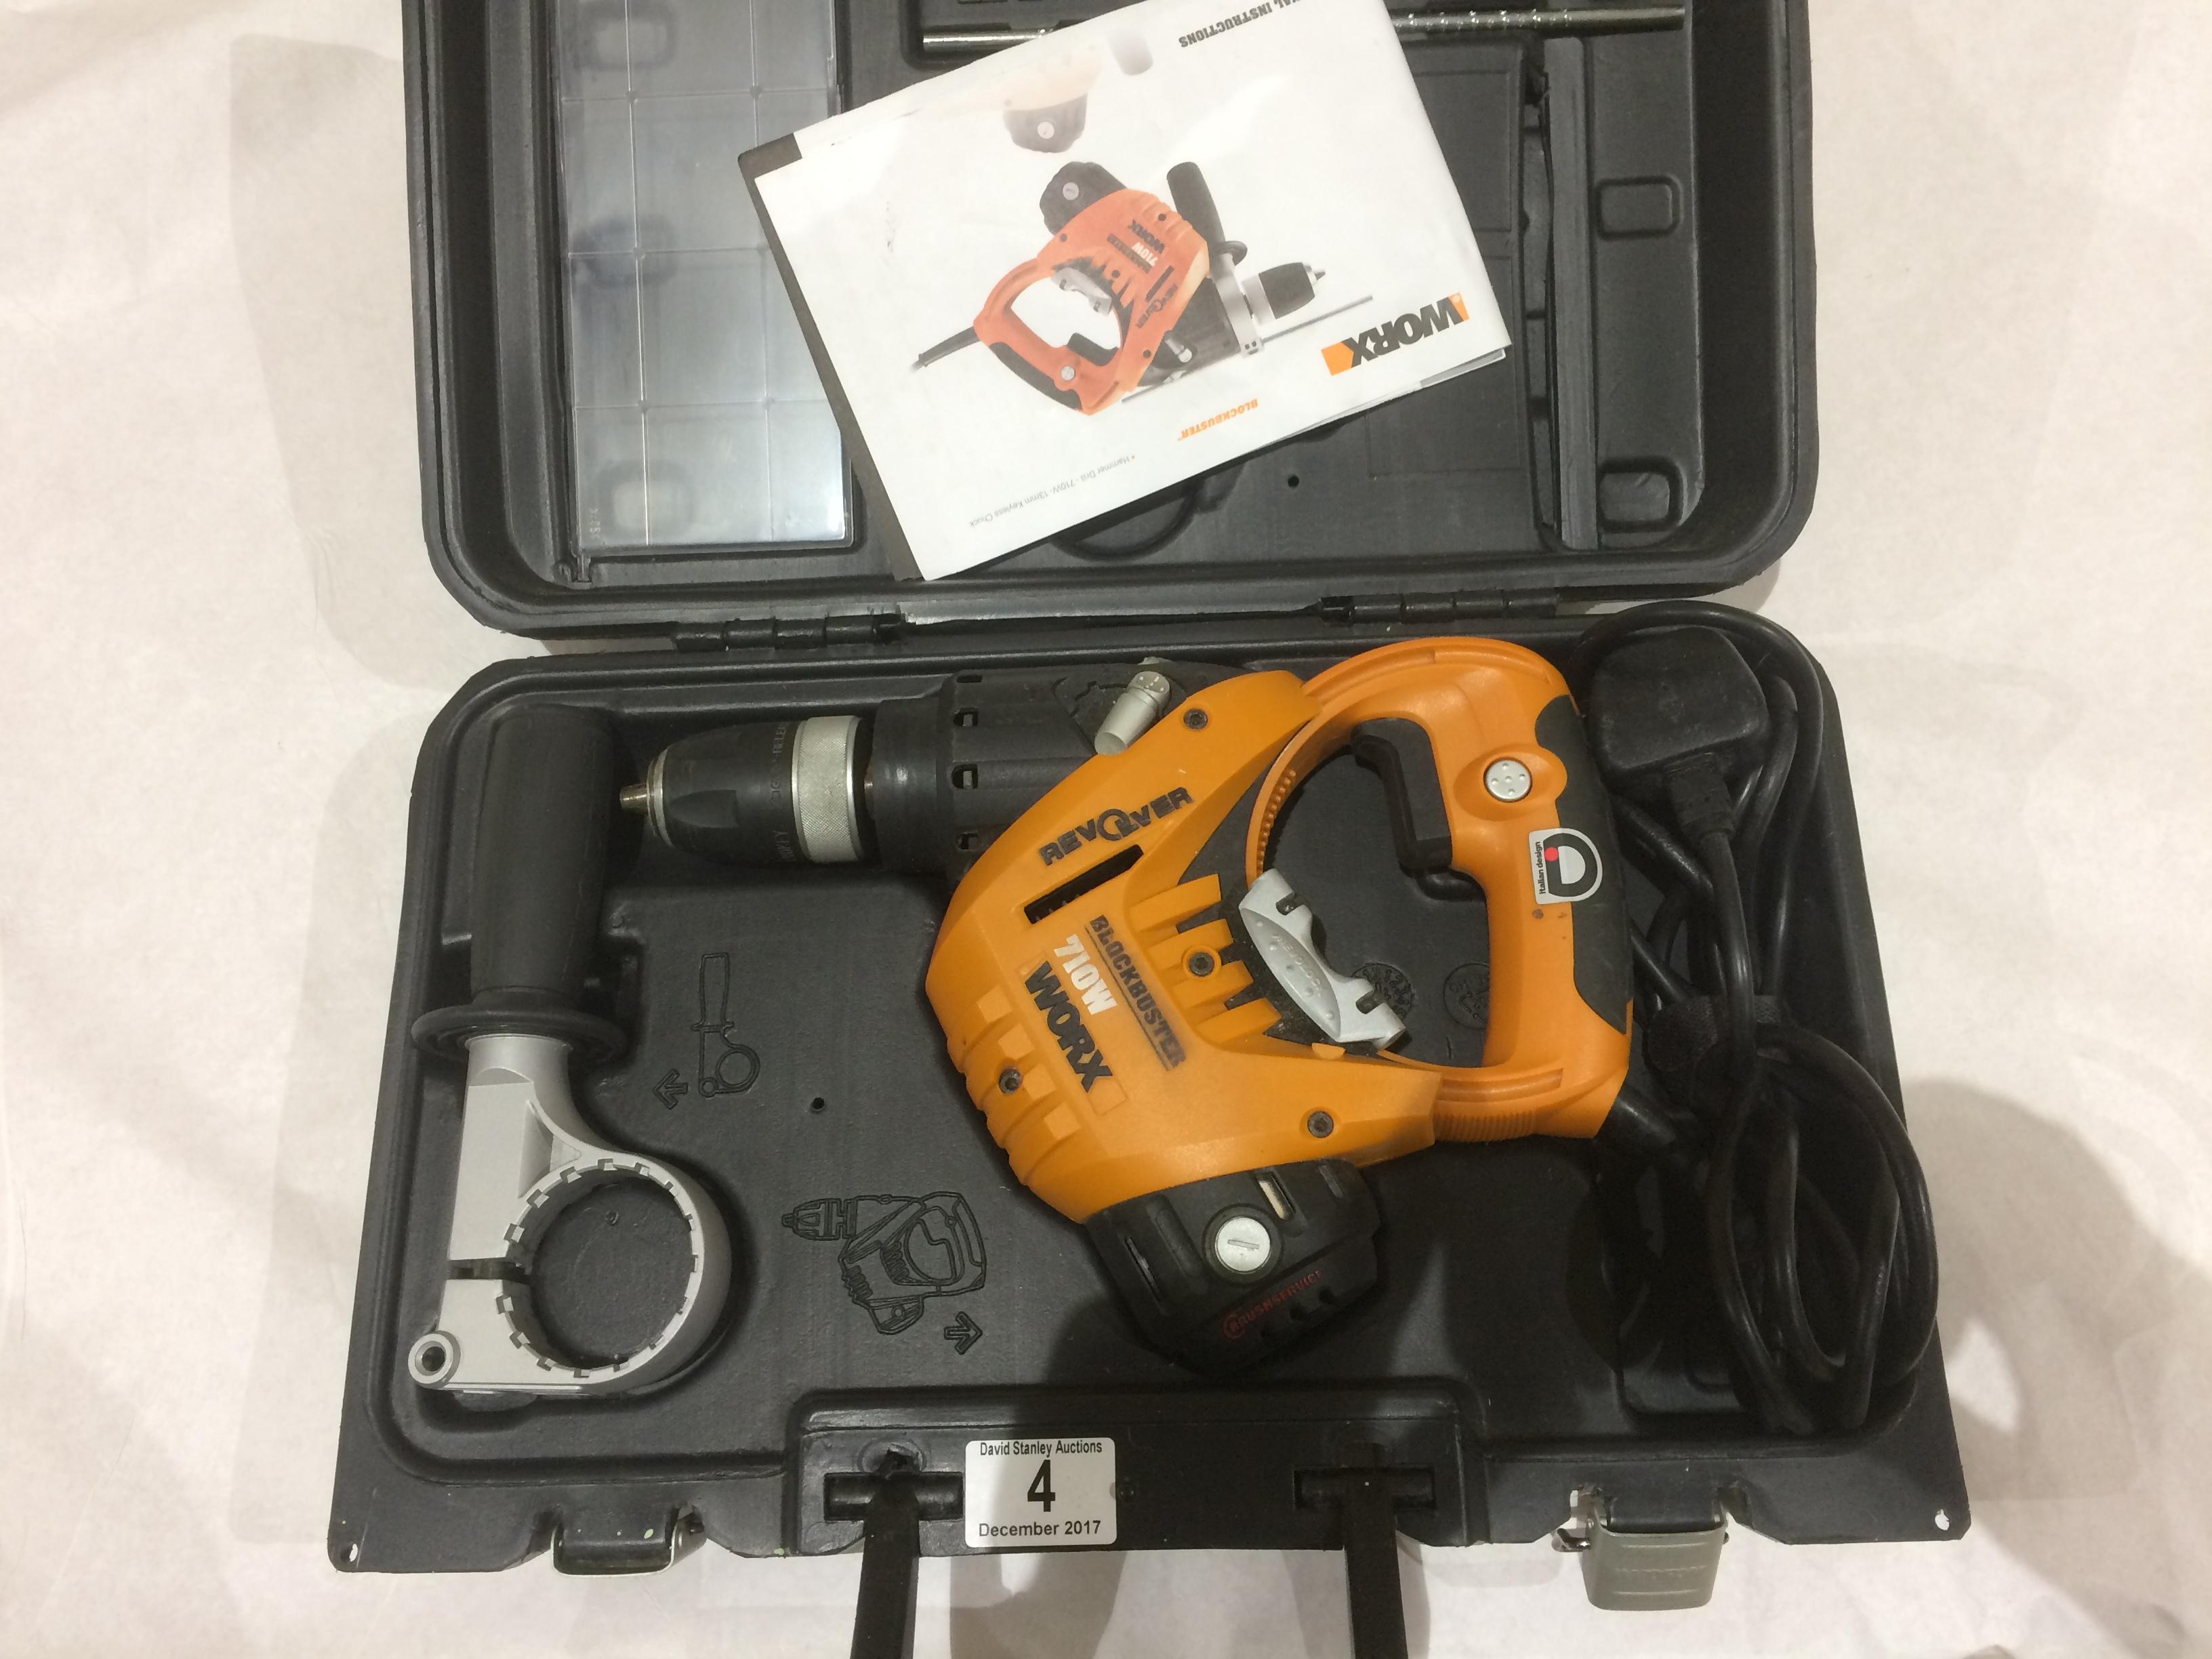 Lot 4 - WORX 710W Drill as new